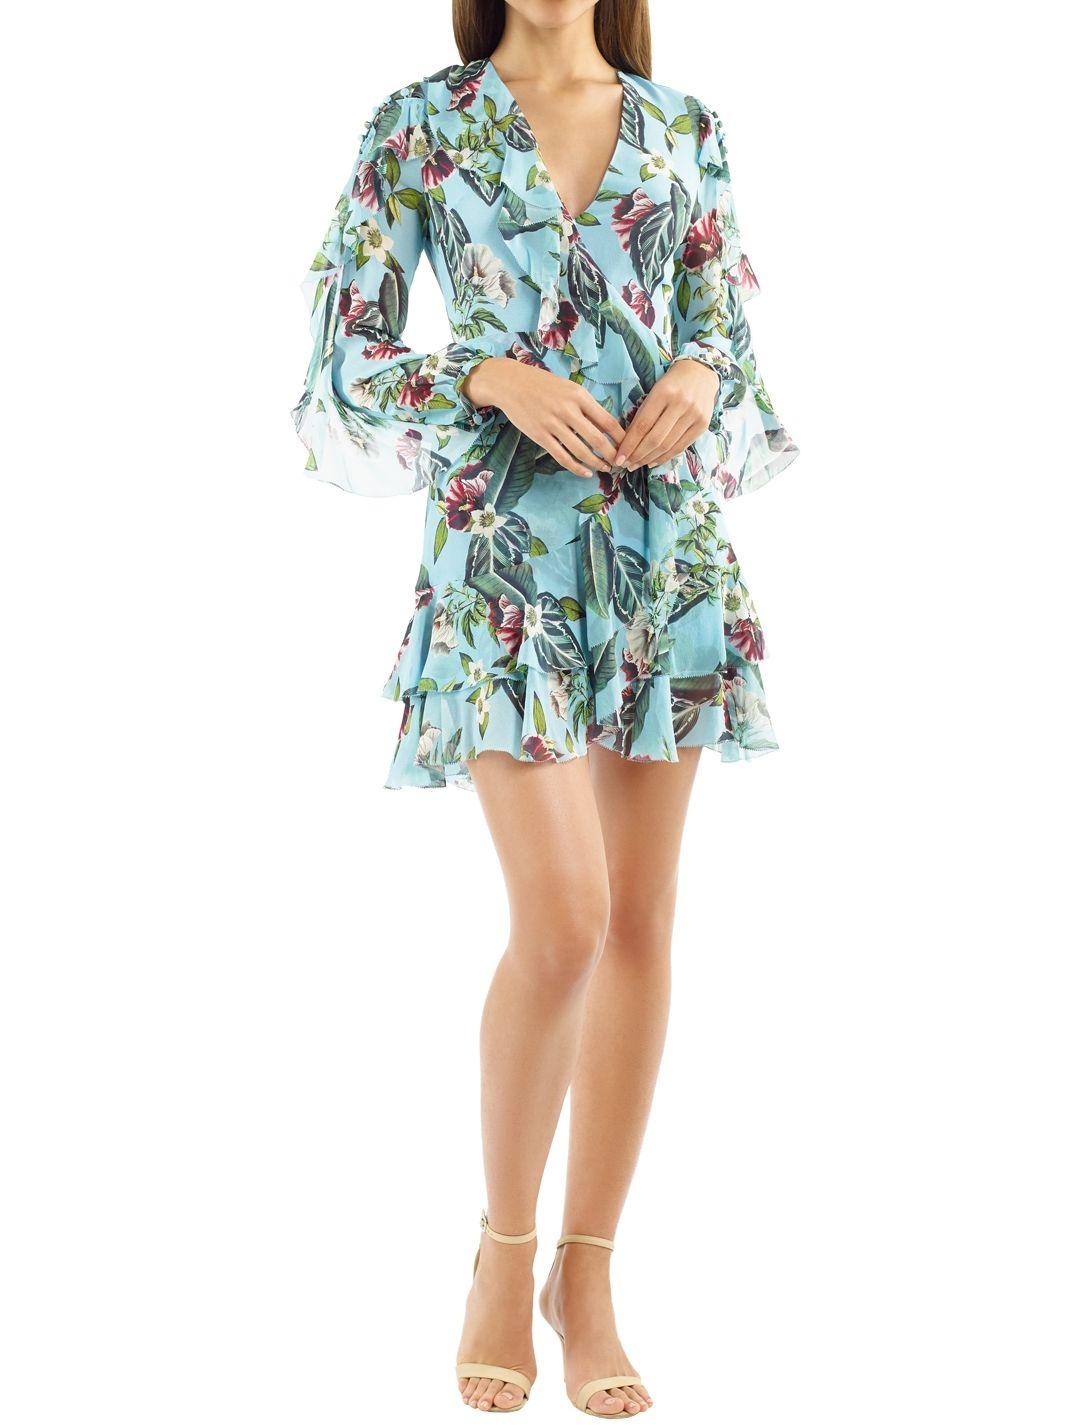 Nicholas the Label - Mayflower Ruffle Mini Dress - Teal - Front